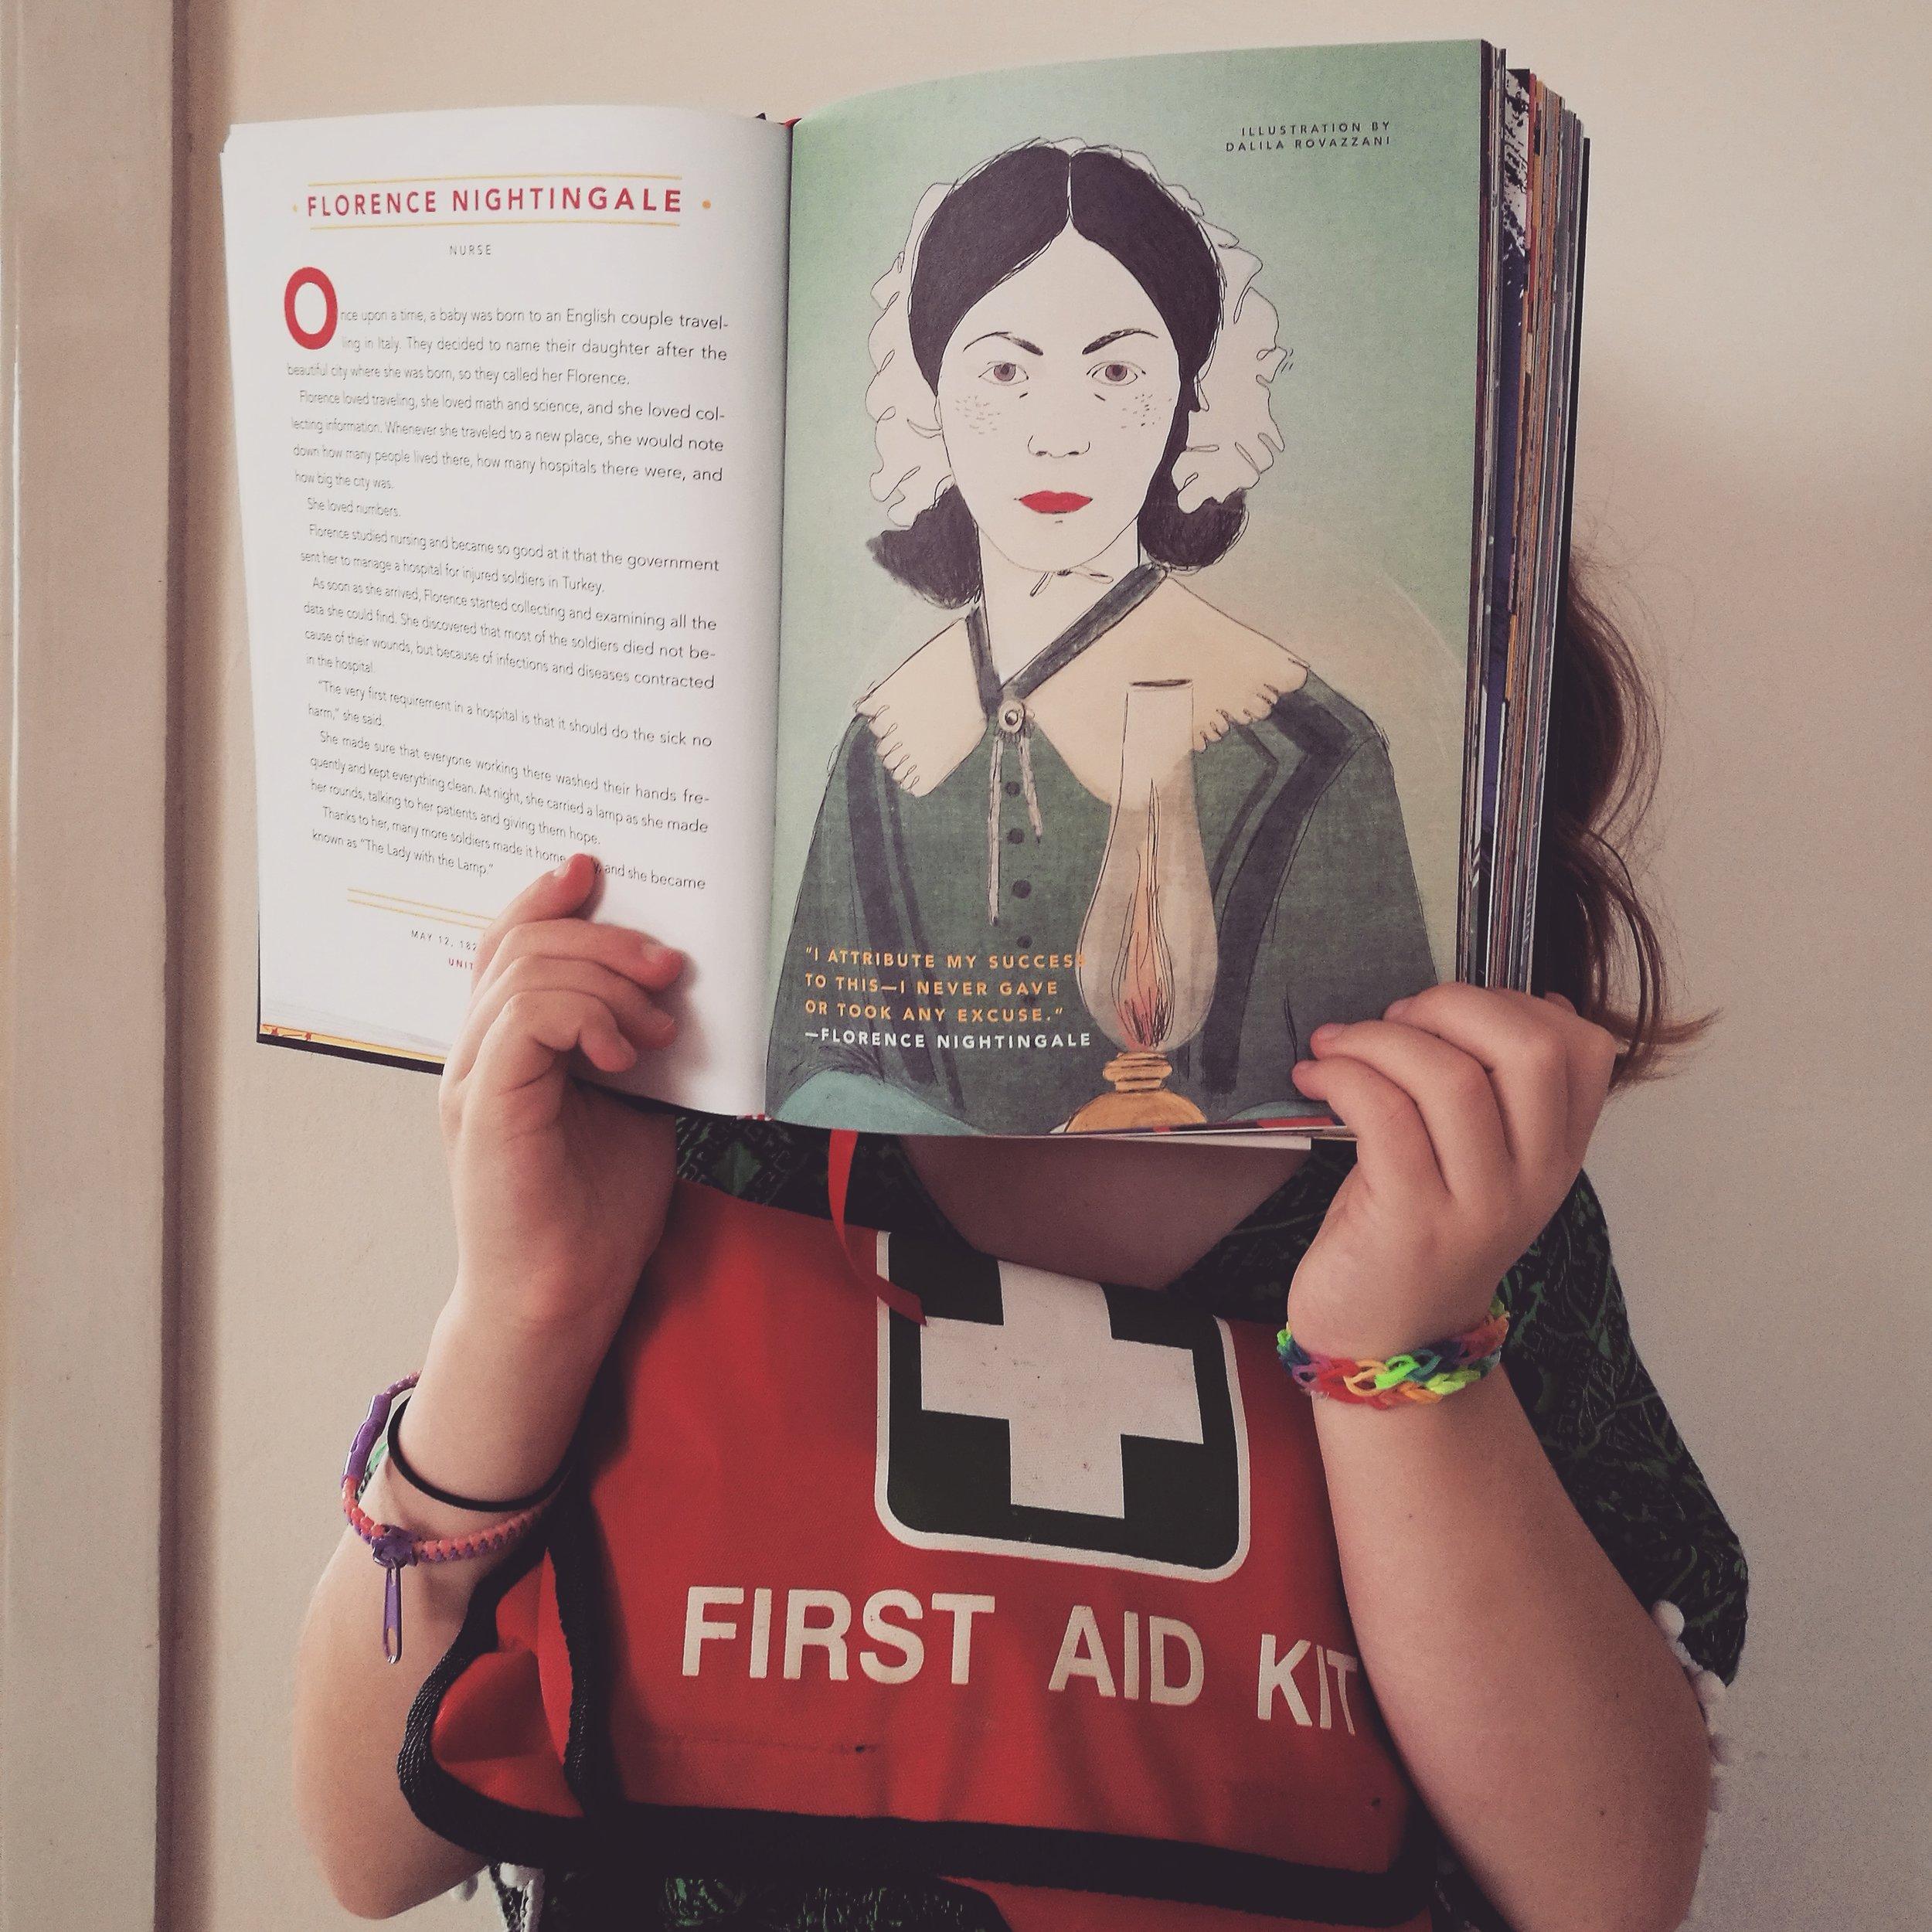 The Parentmedic Class, Florence Nightingale